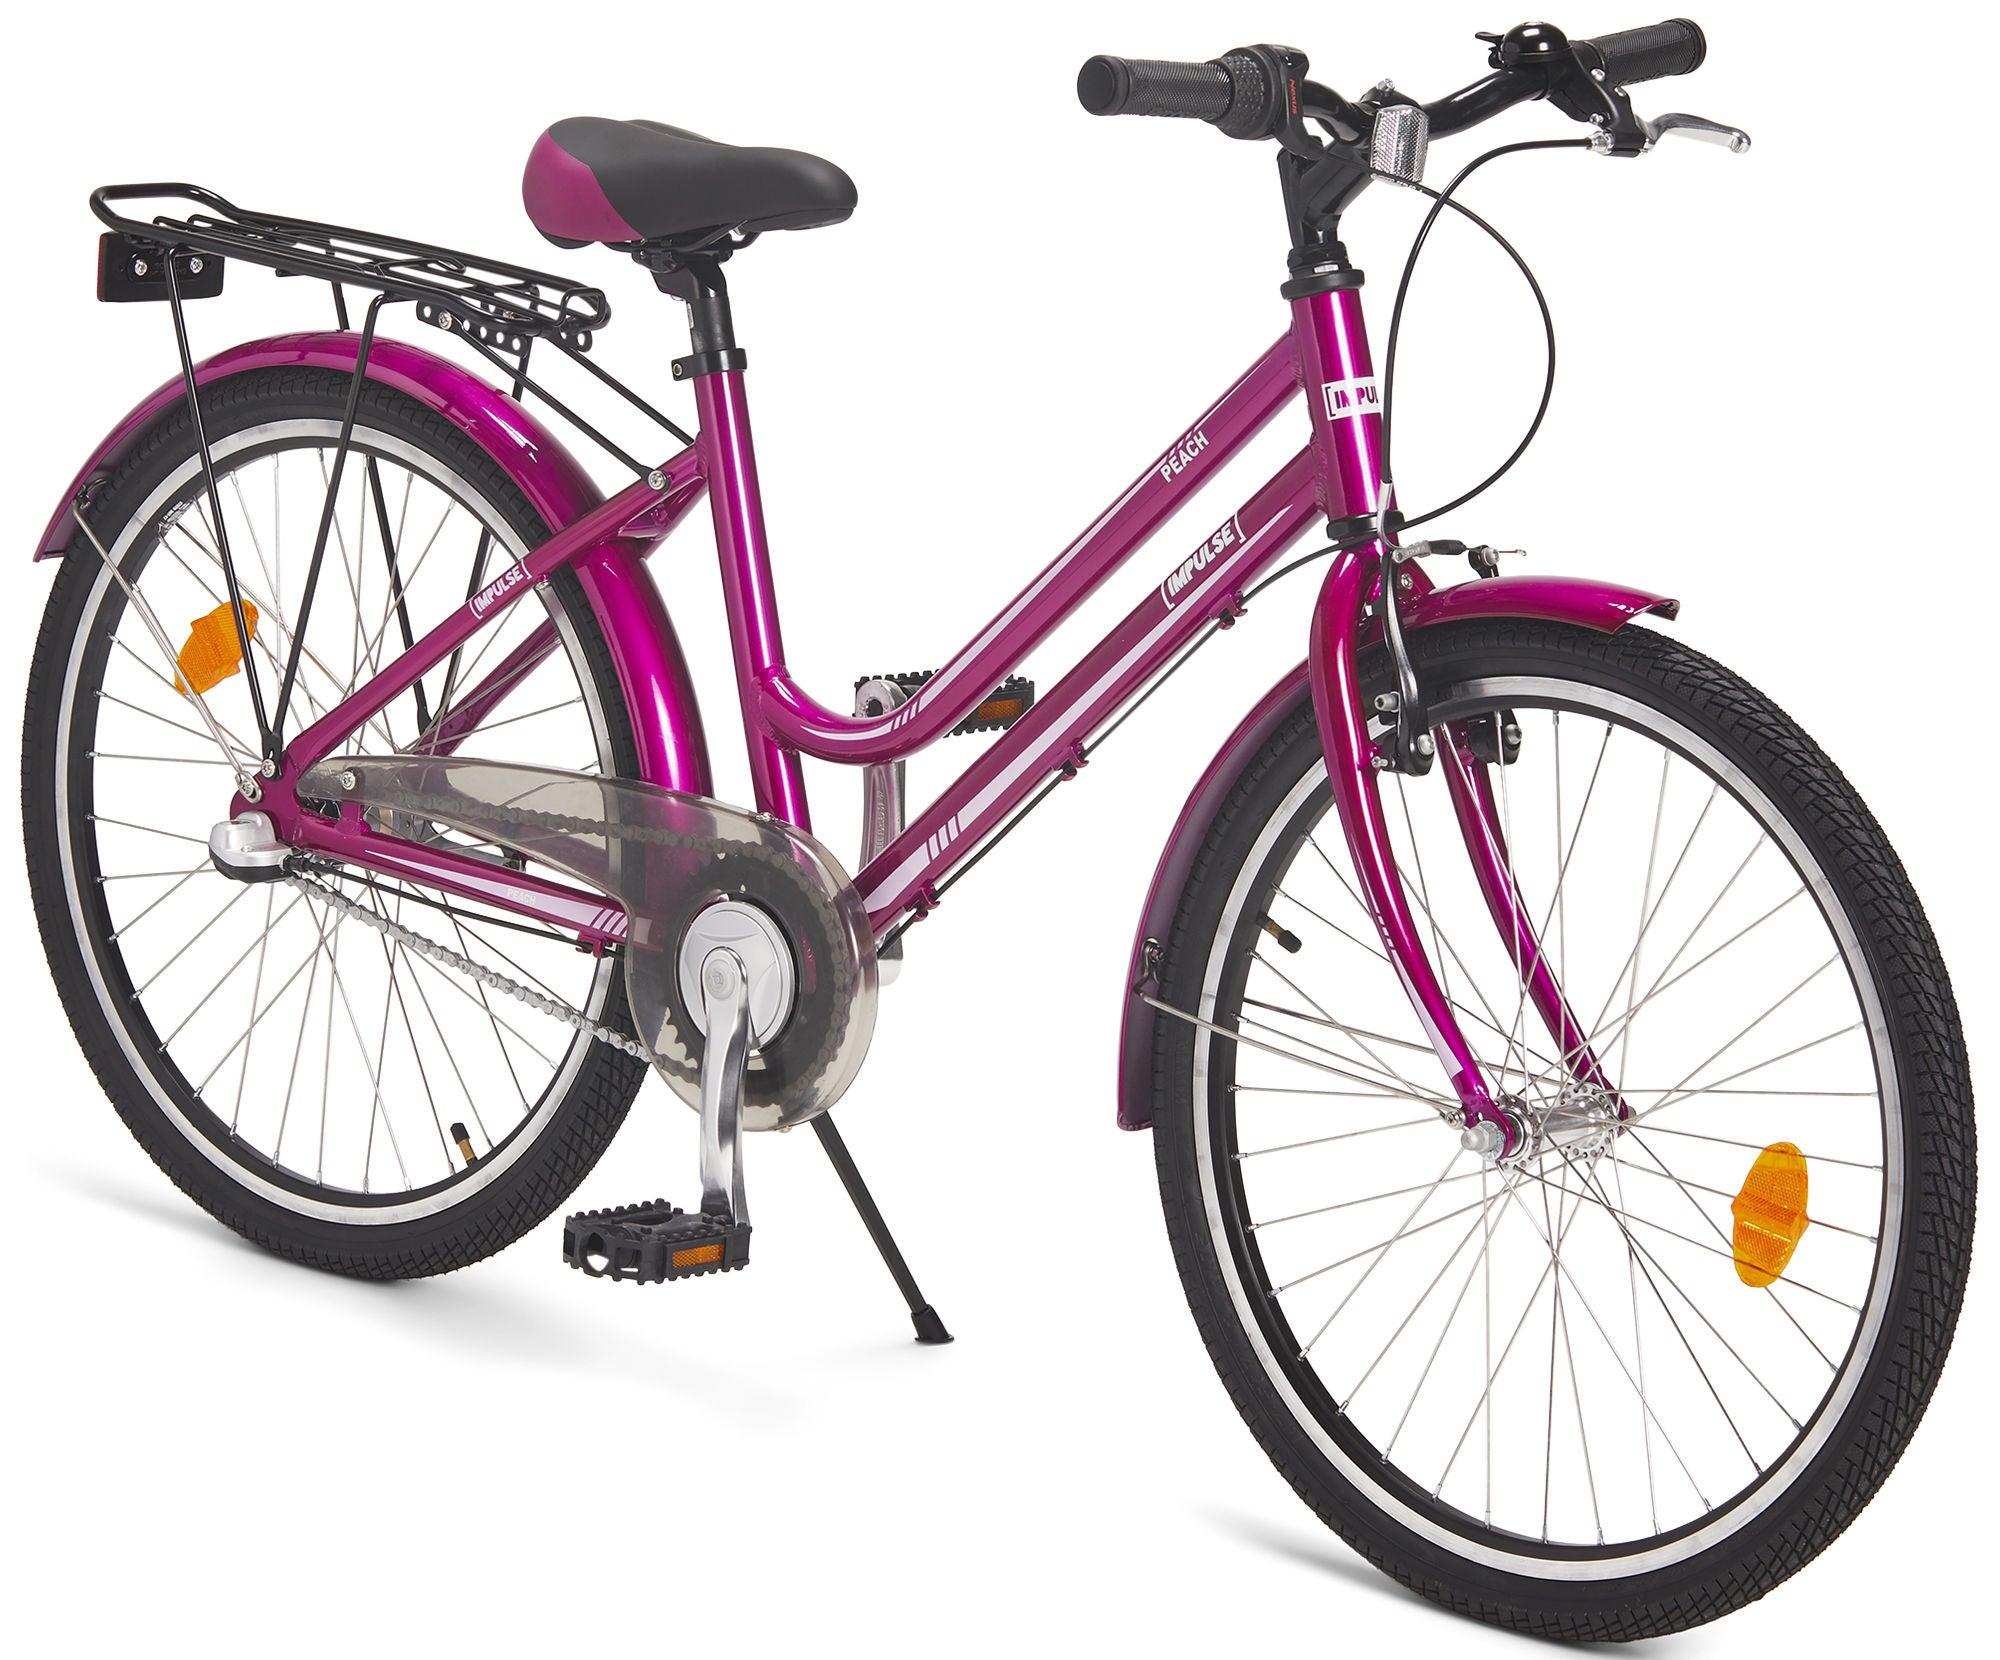 Impulse Premium Peach Juniorcykel 24 Tommer, Pink | City